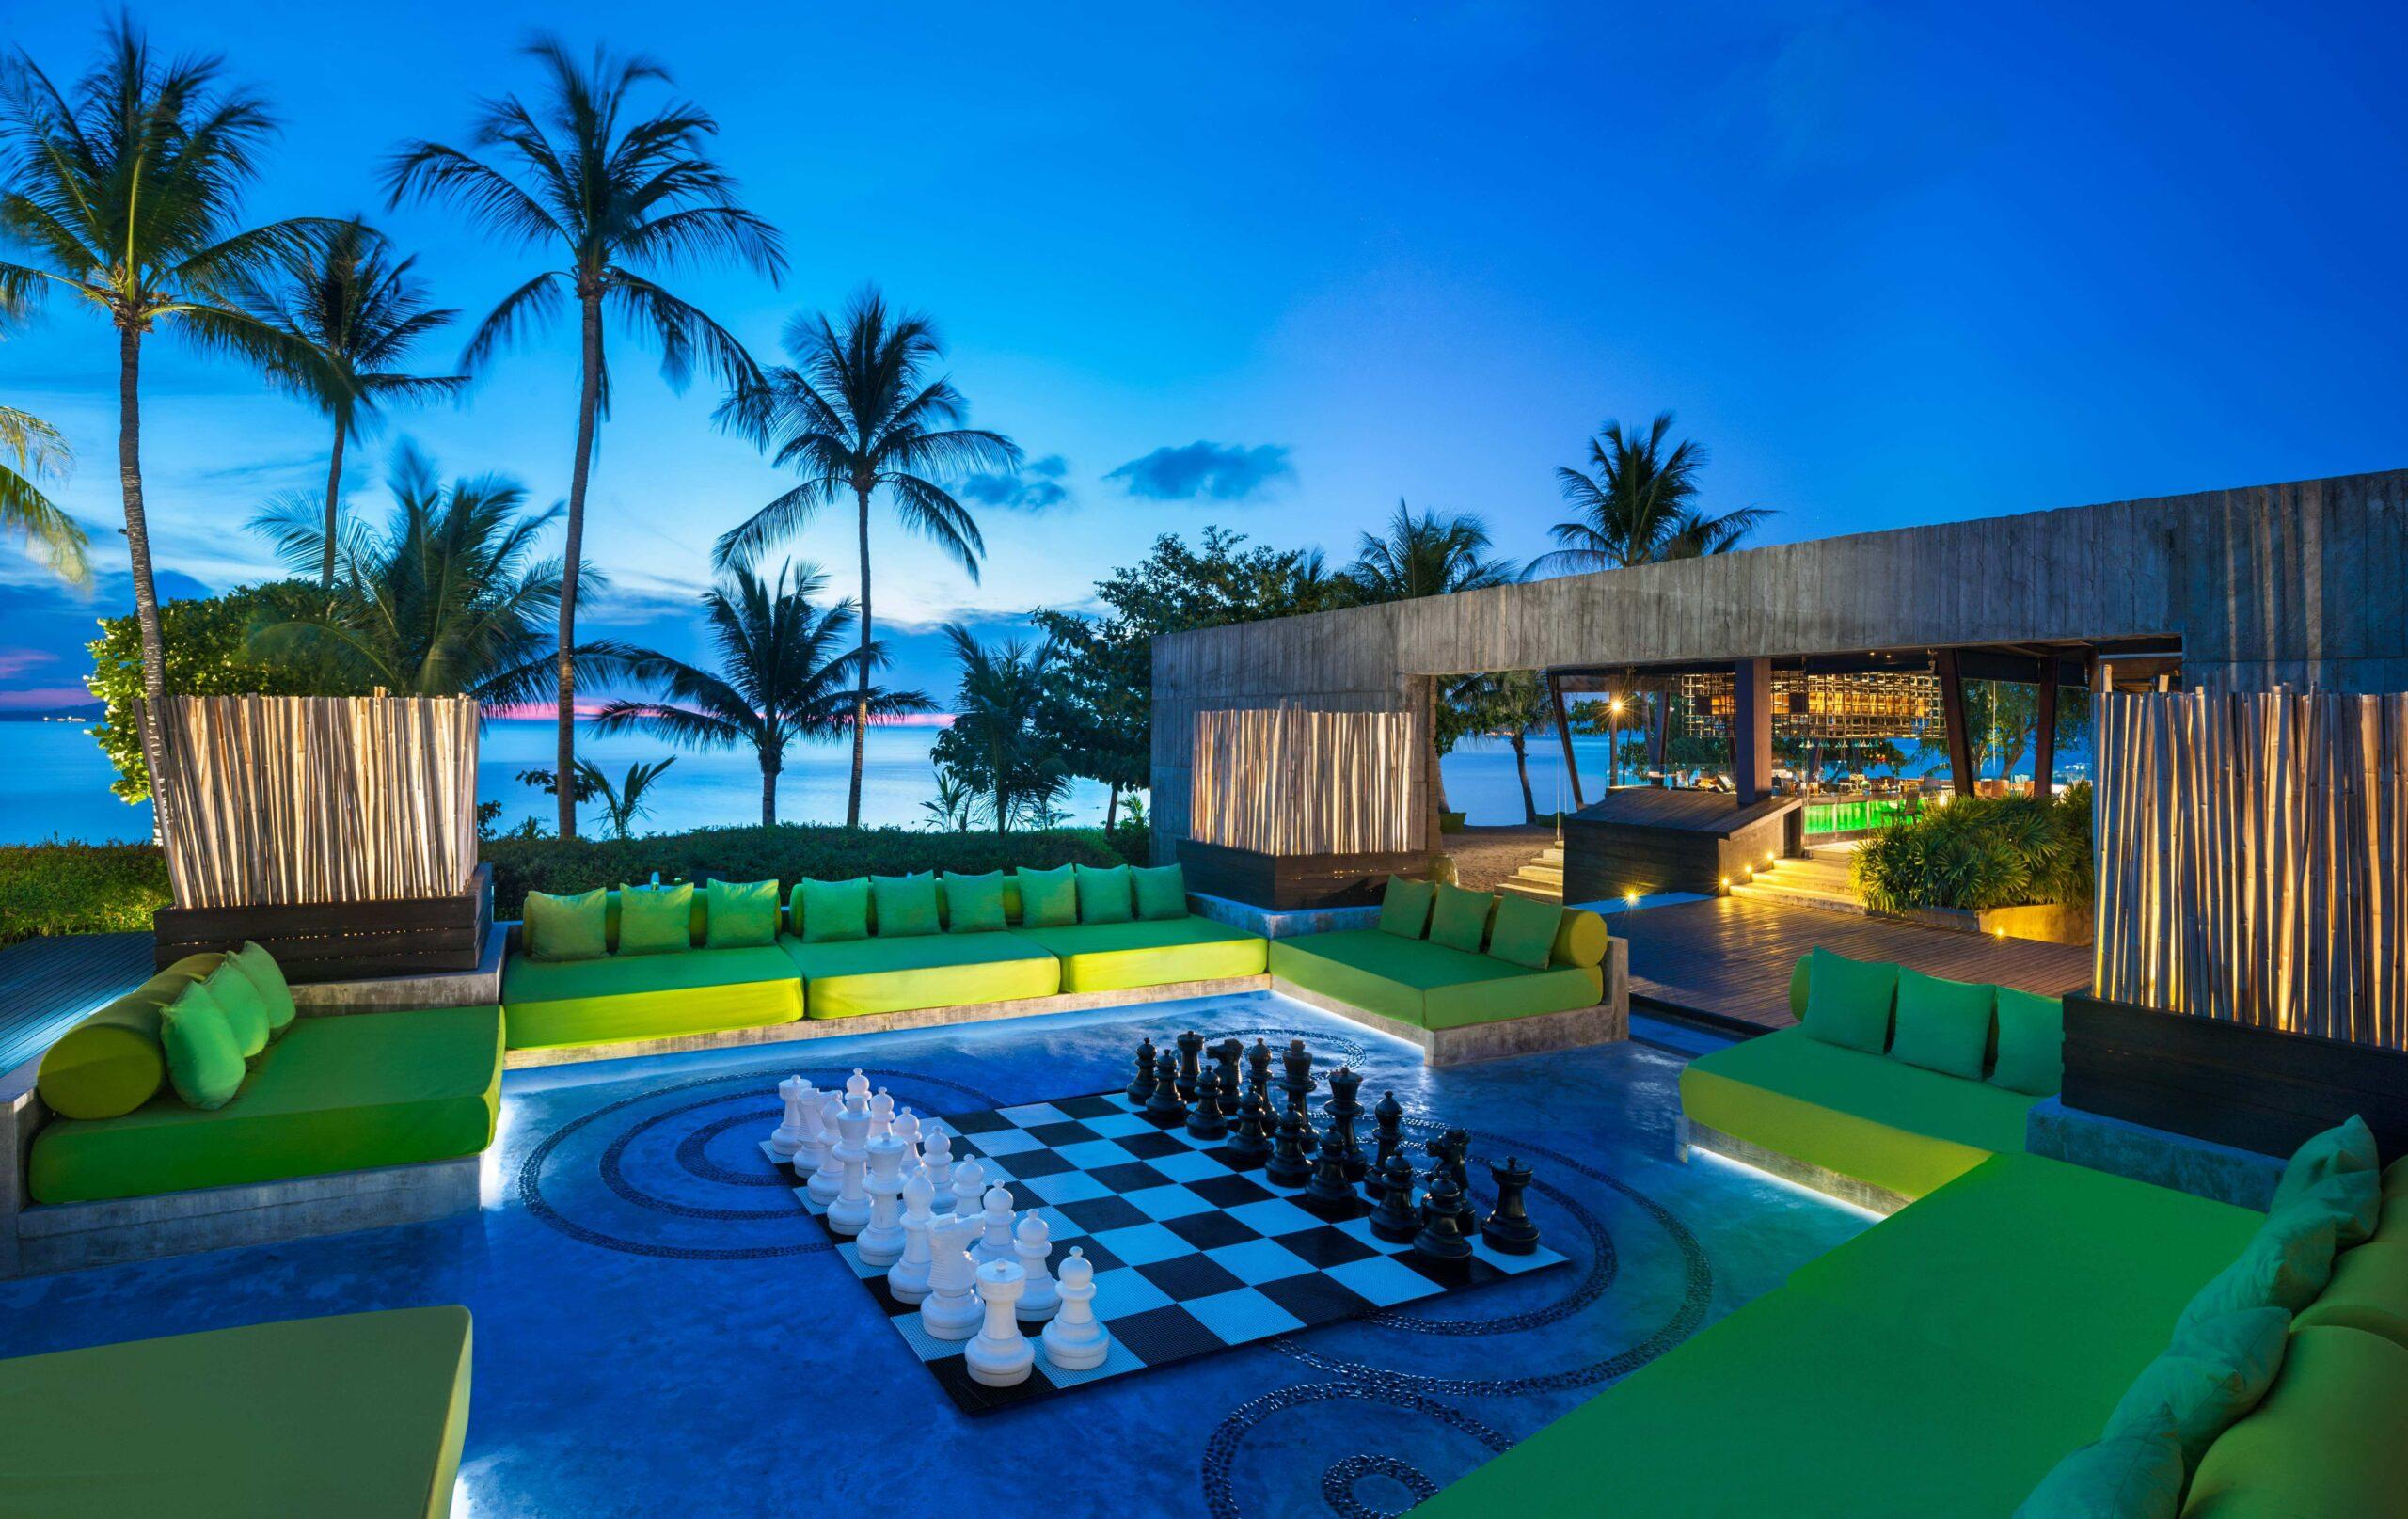 outdoor chess-w koh samui thailand